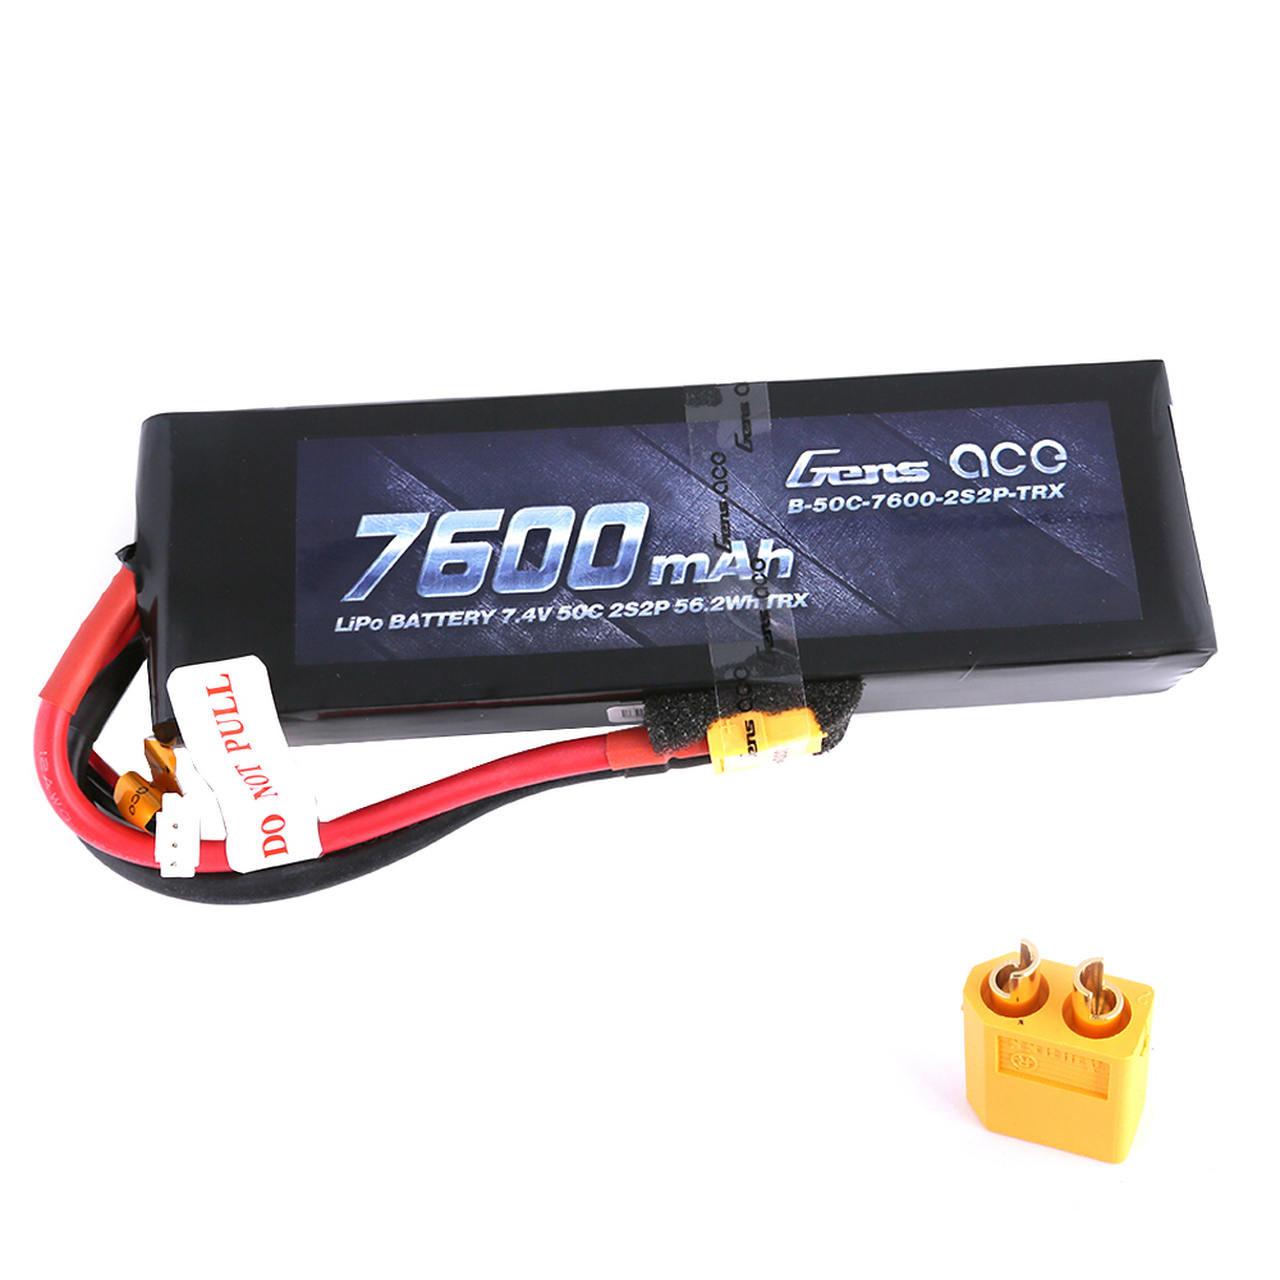 Gens ace 7600mAh 7.4V 50C 2S2P Lipo Battery Pack with XT60 Plug